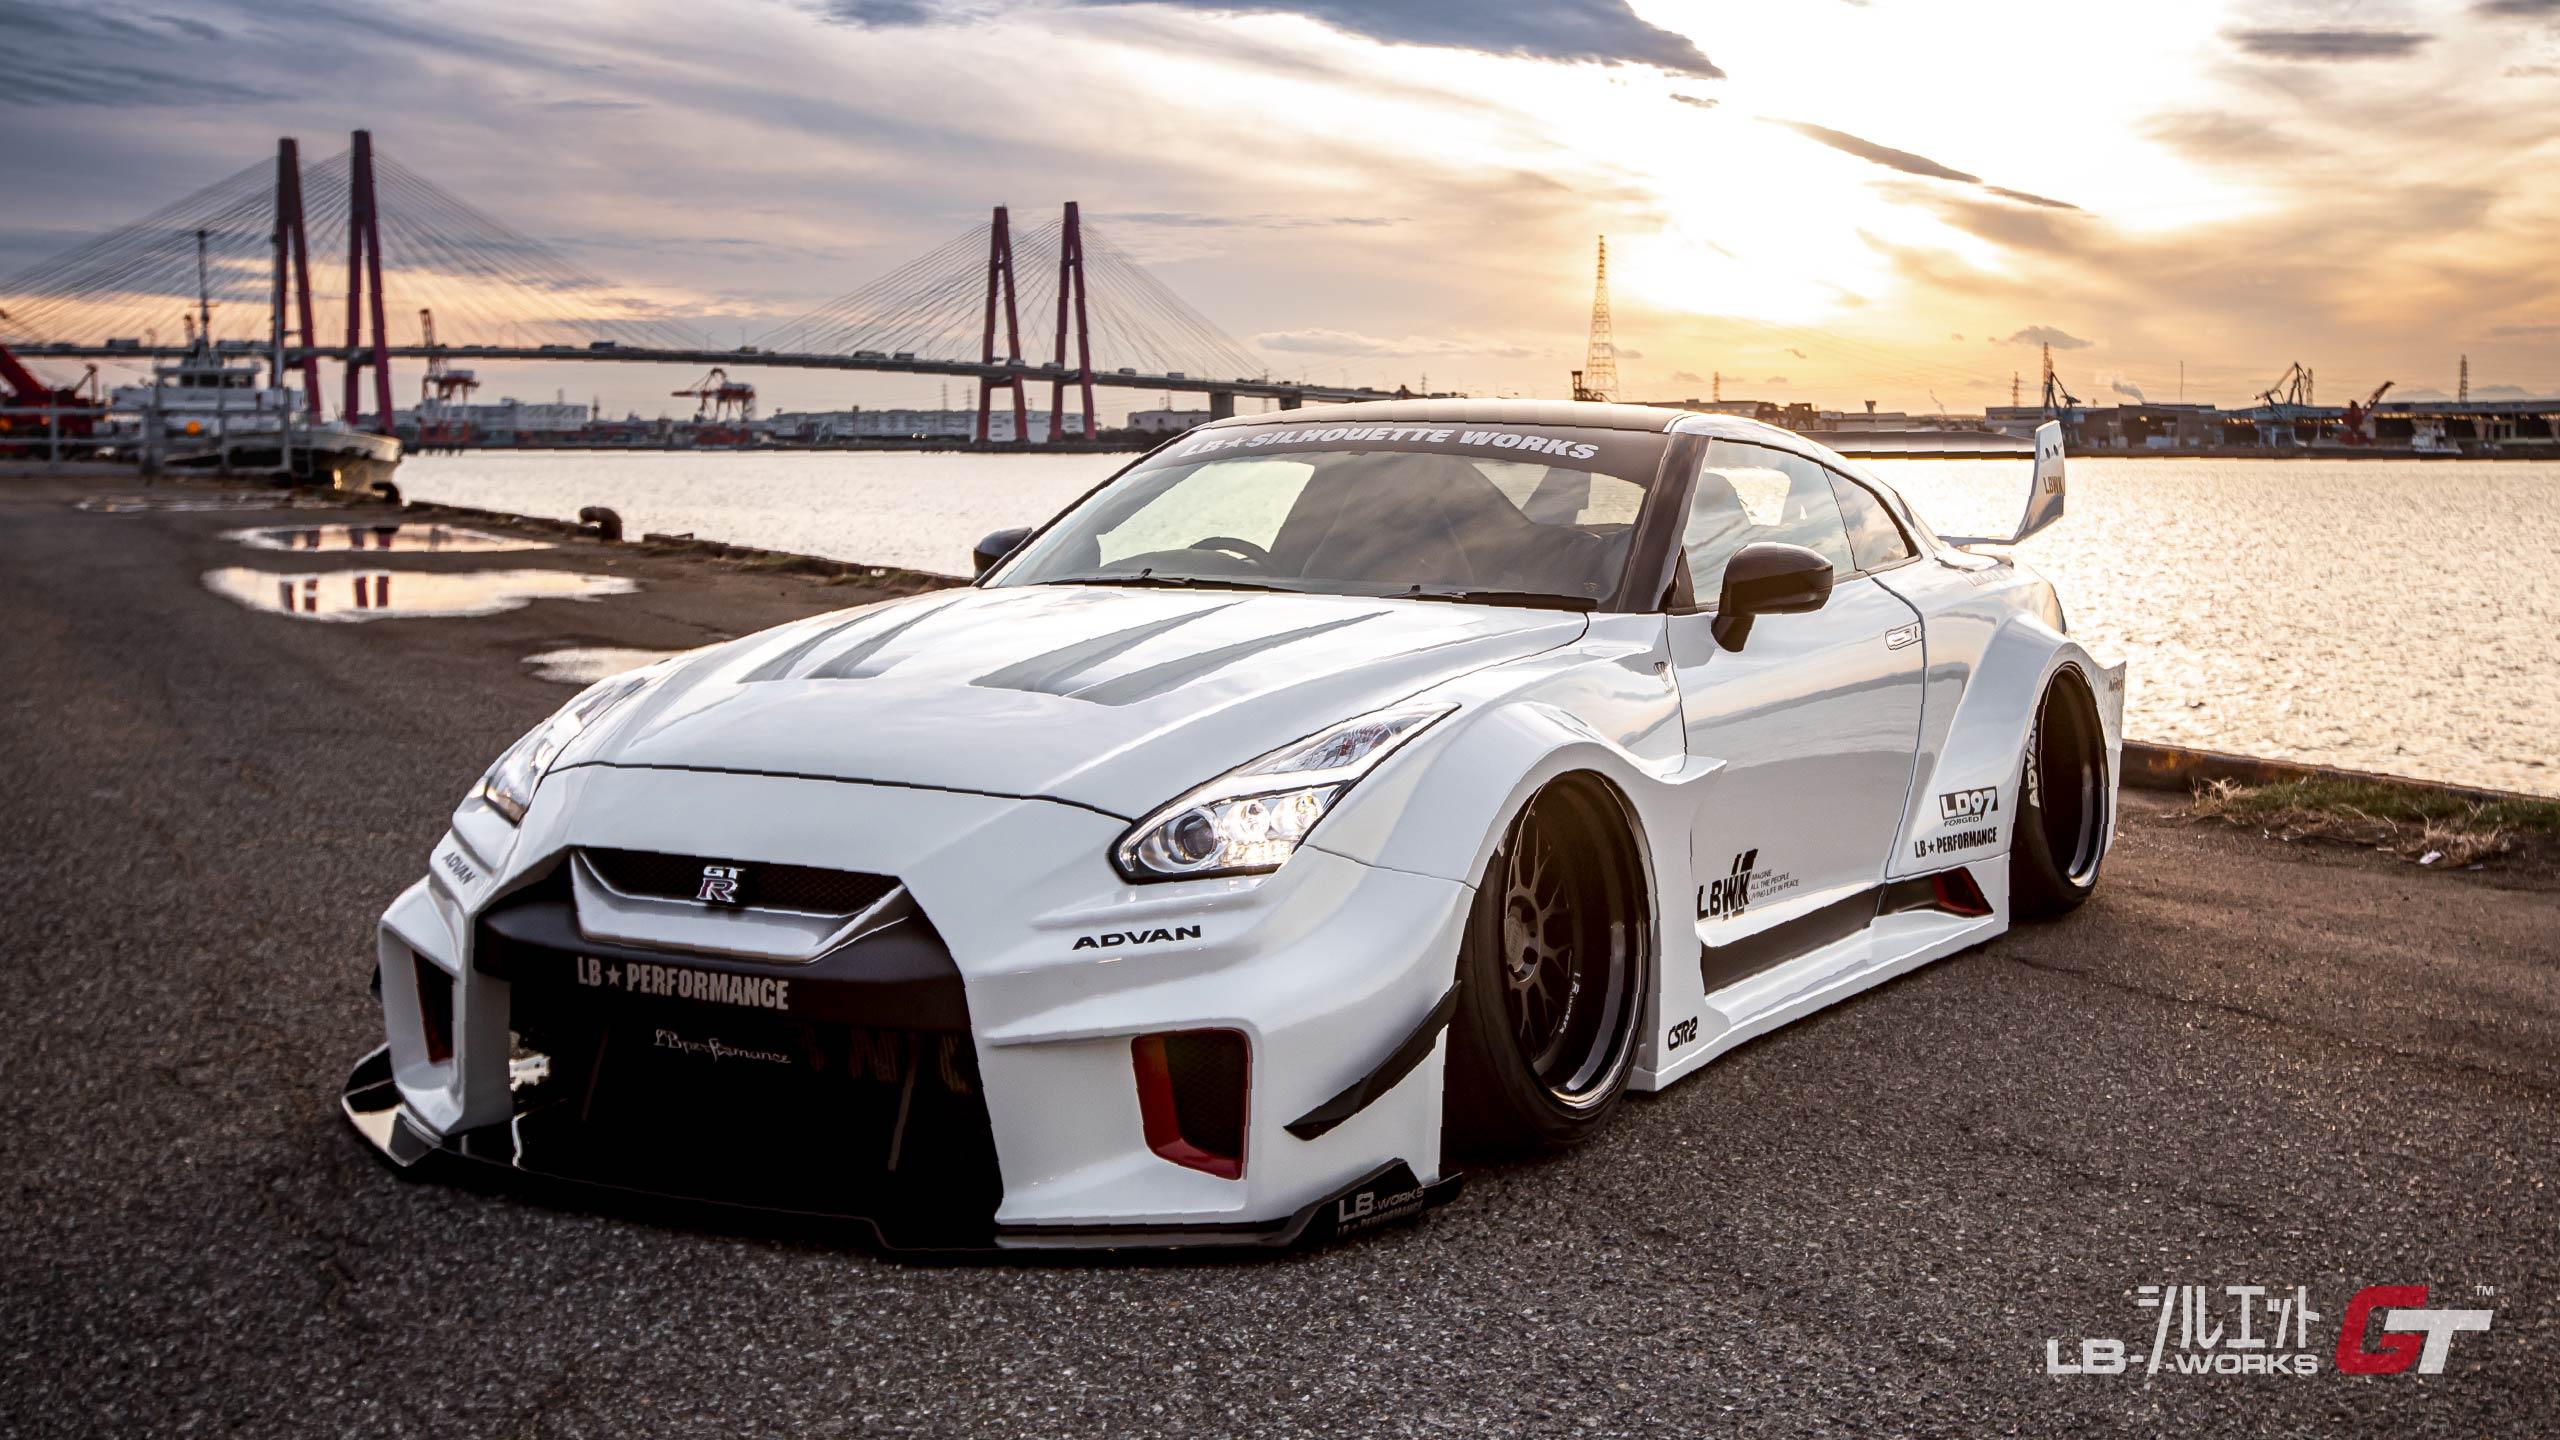 Liberty-Walk-Nissan-GT-R-Super-Silhouette-23